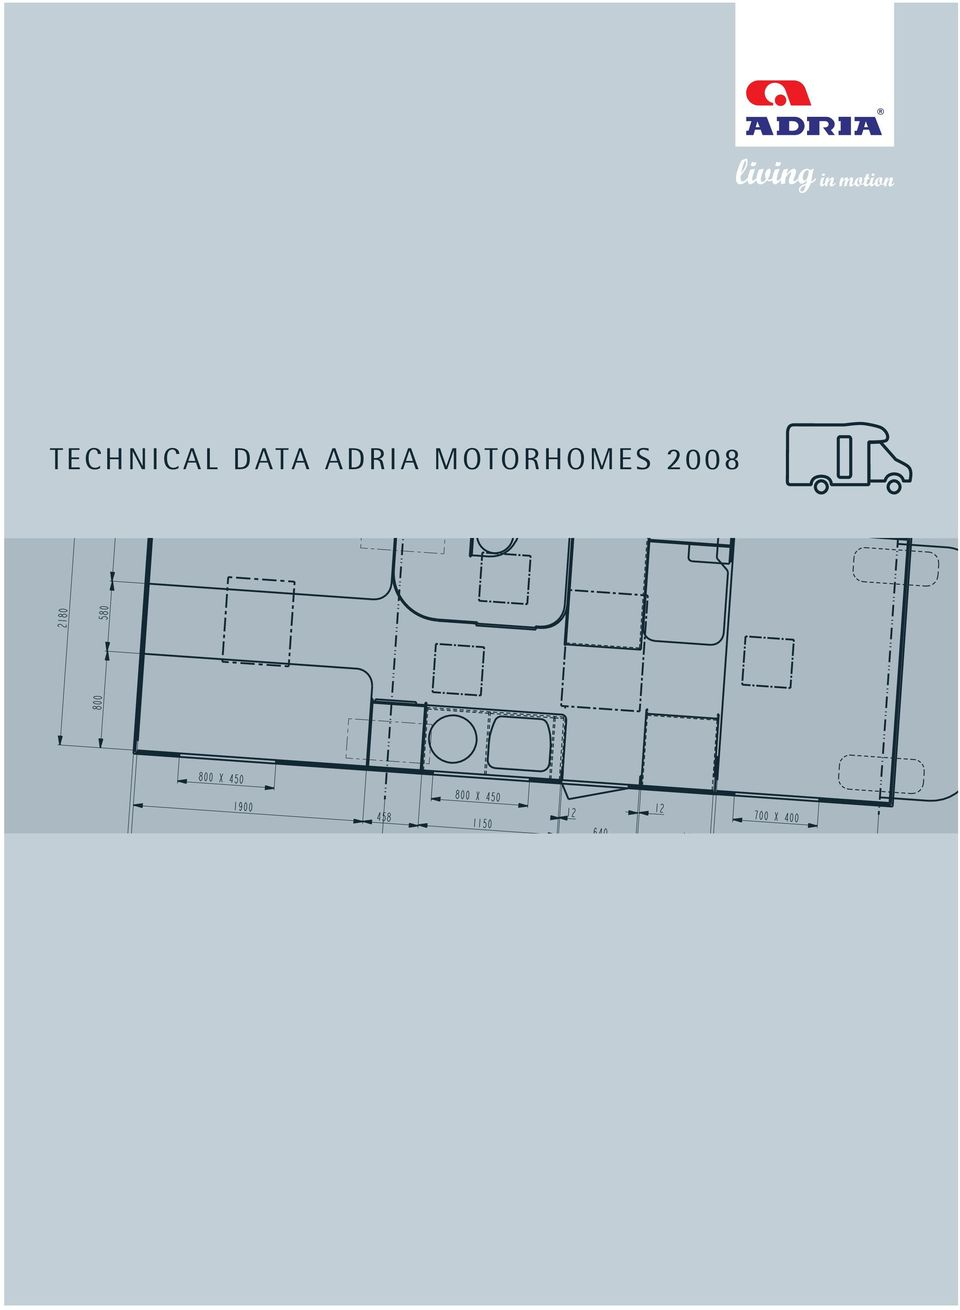 medium resolution of 2 compact adria motorhomes 2 vision i 677 sp i 707 sg 3 5 izola alcoven a 697 sl semi integrated s 687 sp s 687 spg 6 9 coral alcoven a 660 sp a